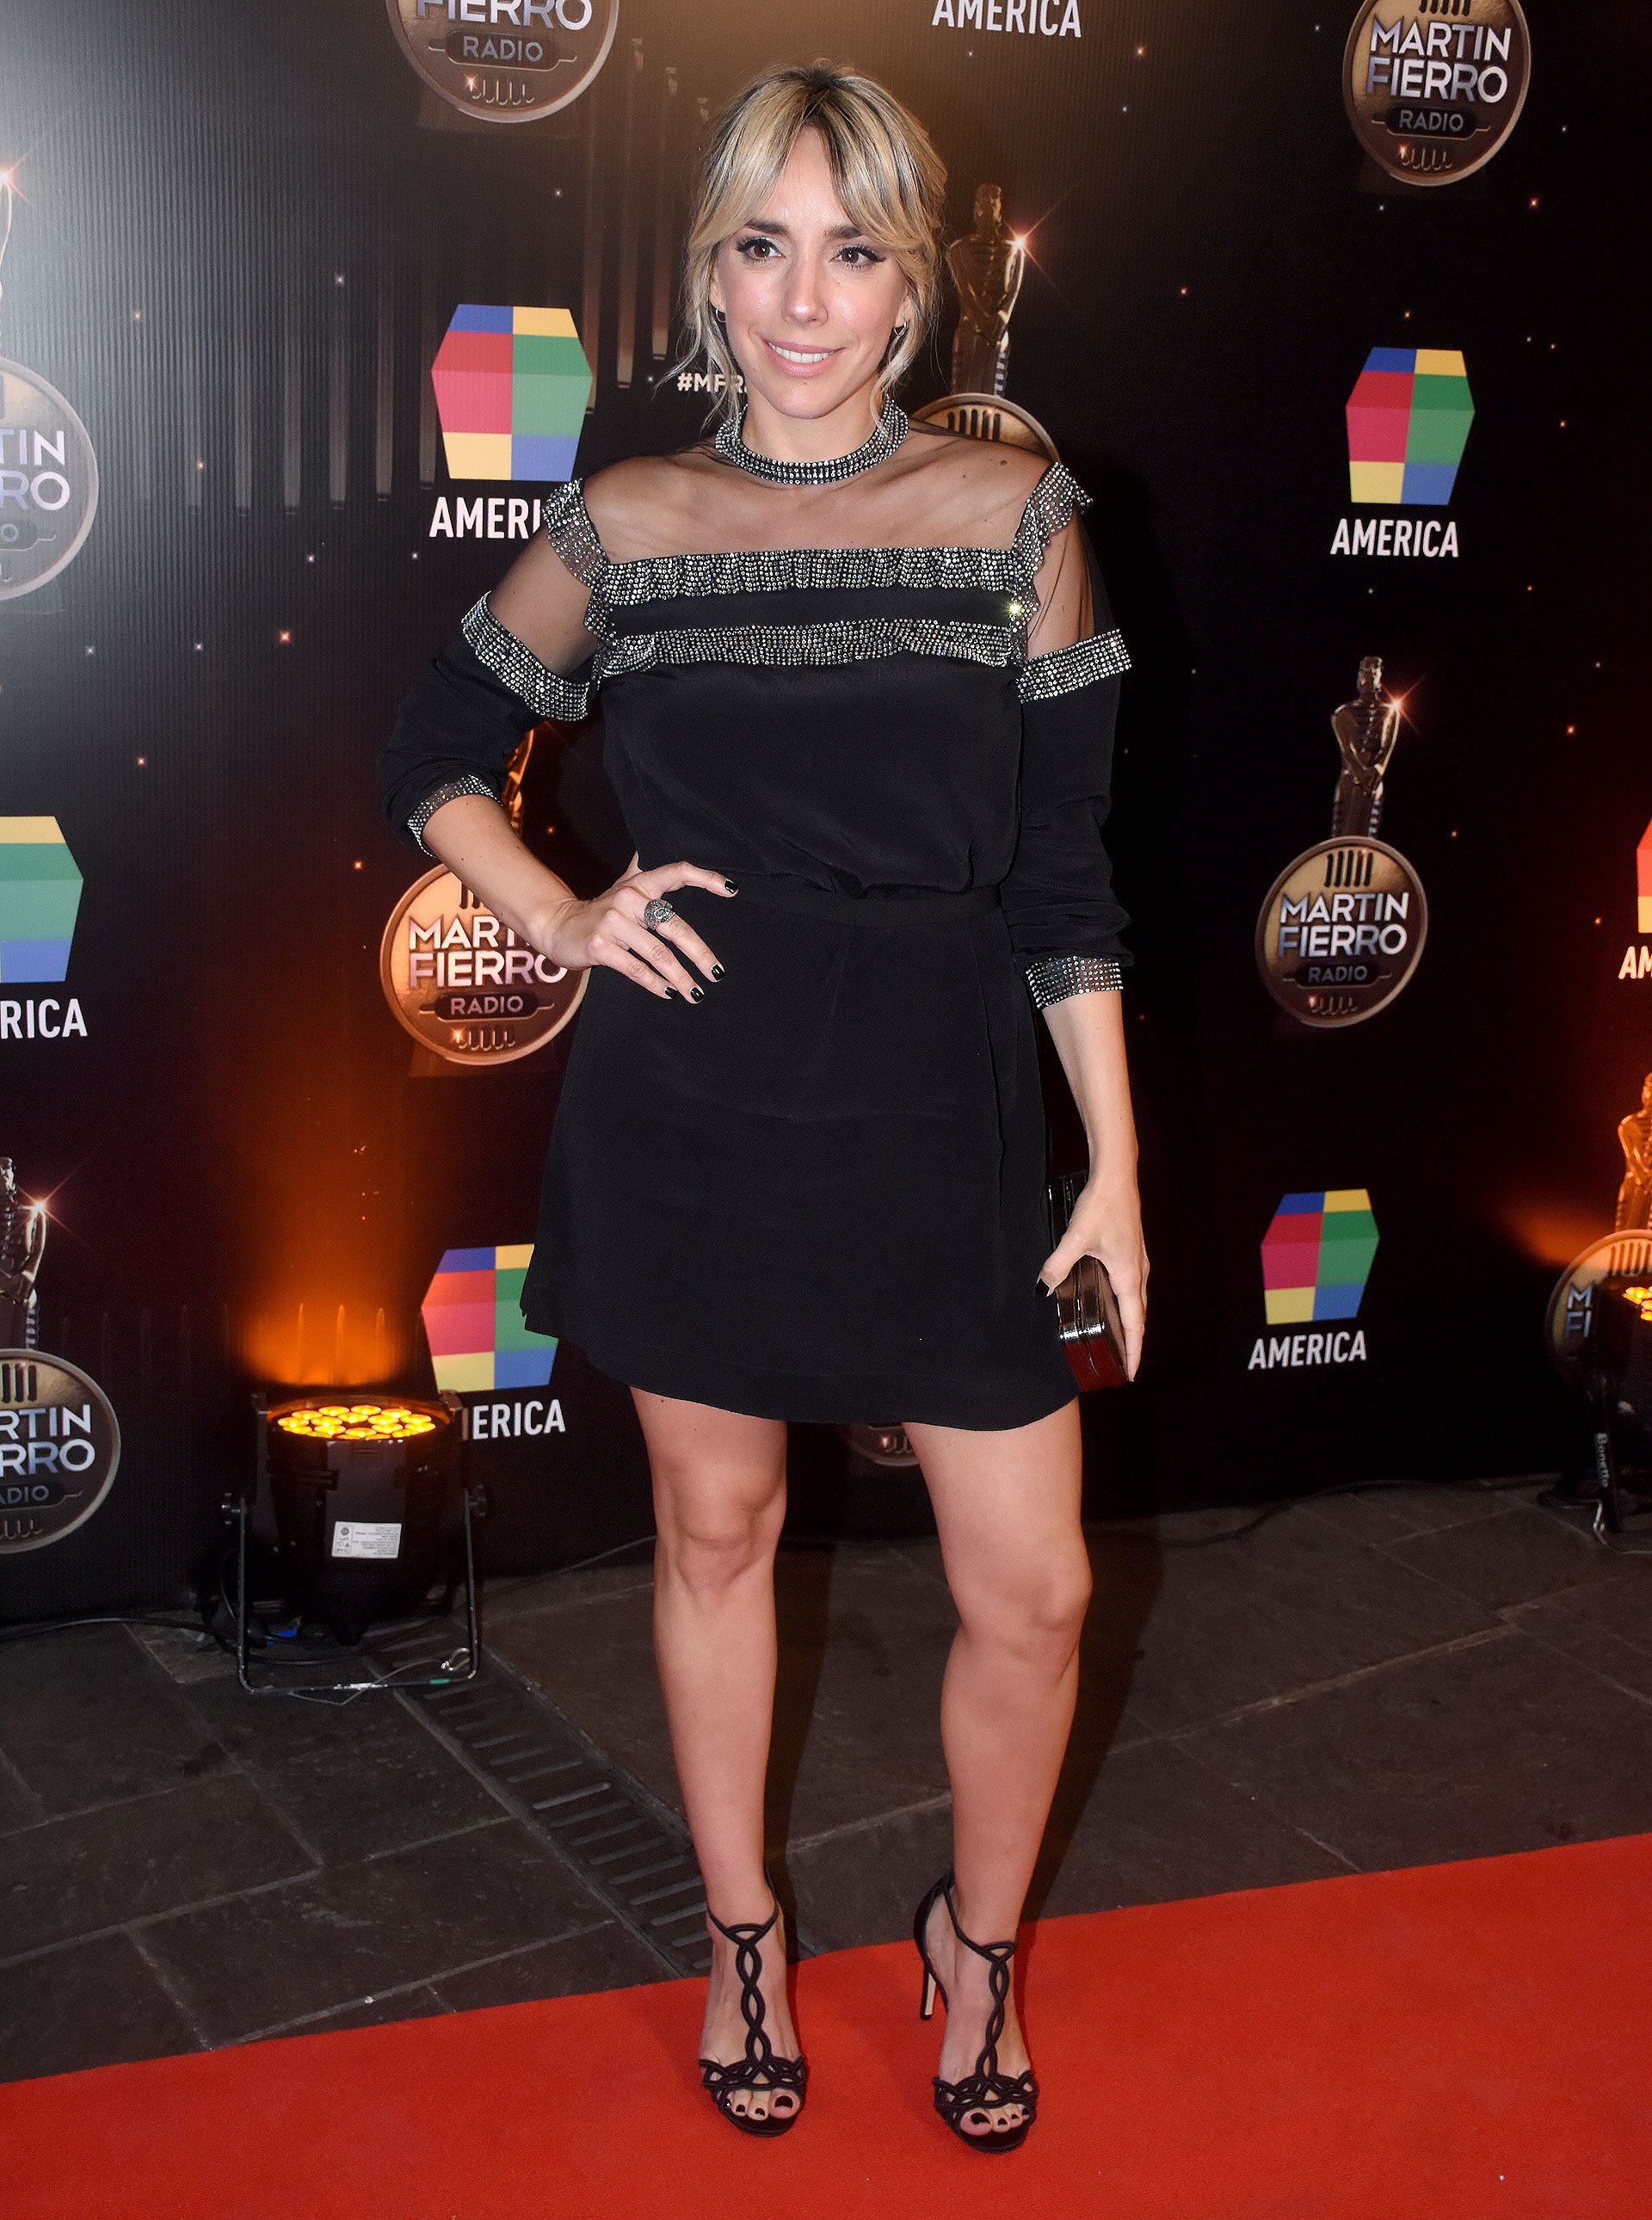 Tamara Pettinato